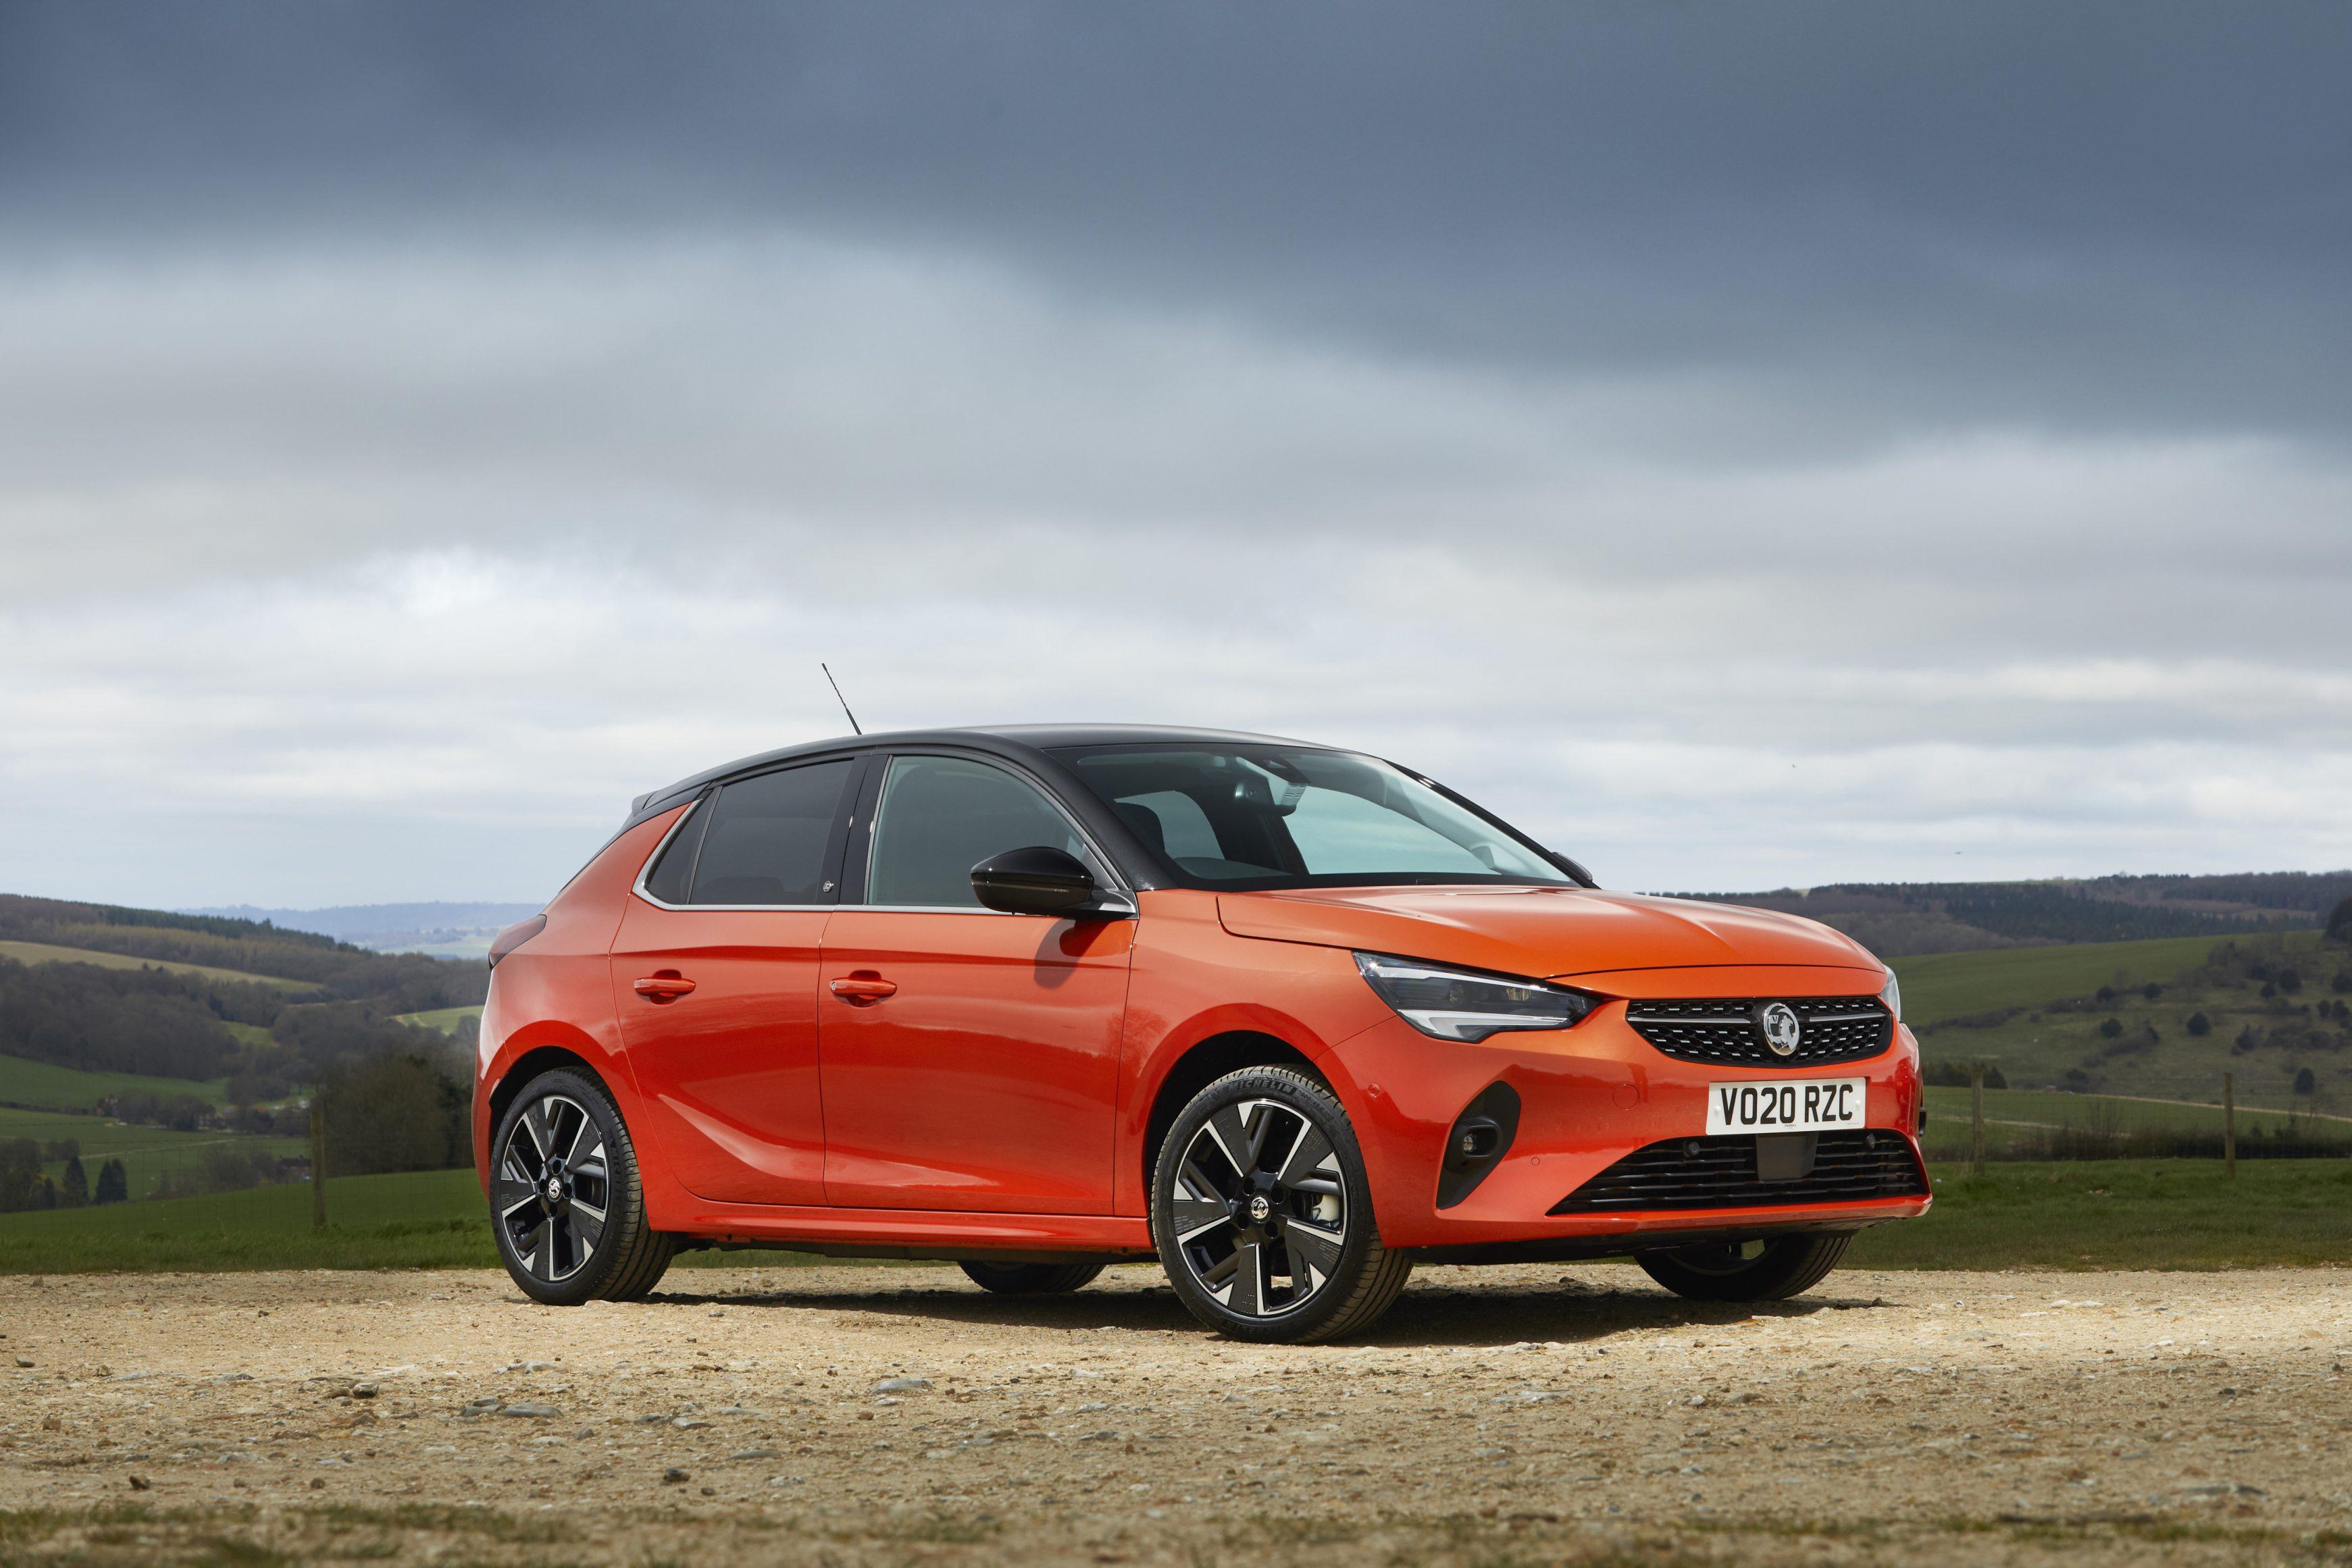 Vauxhall Corsa-e free charging 2